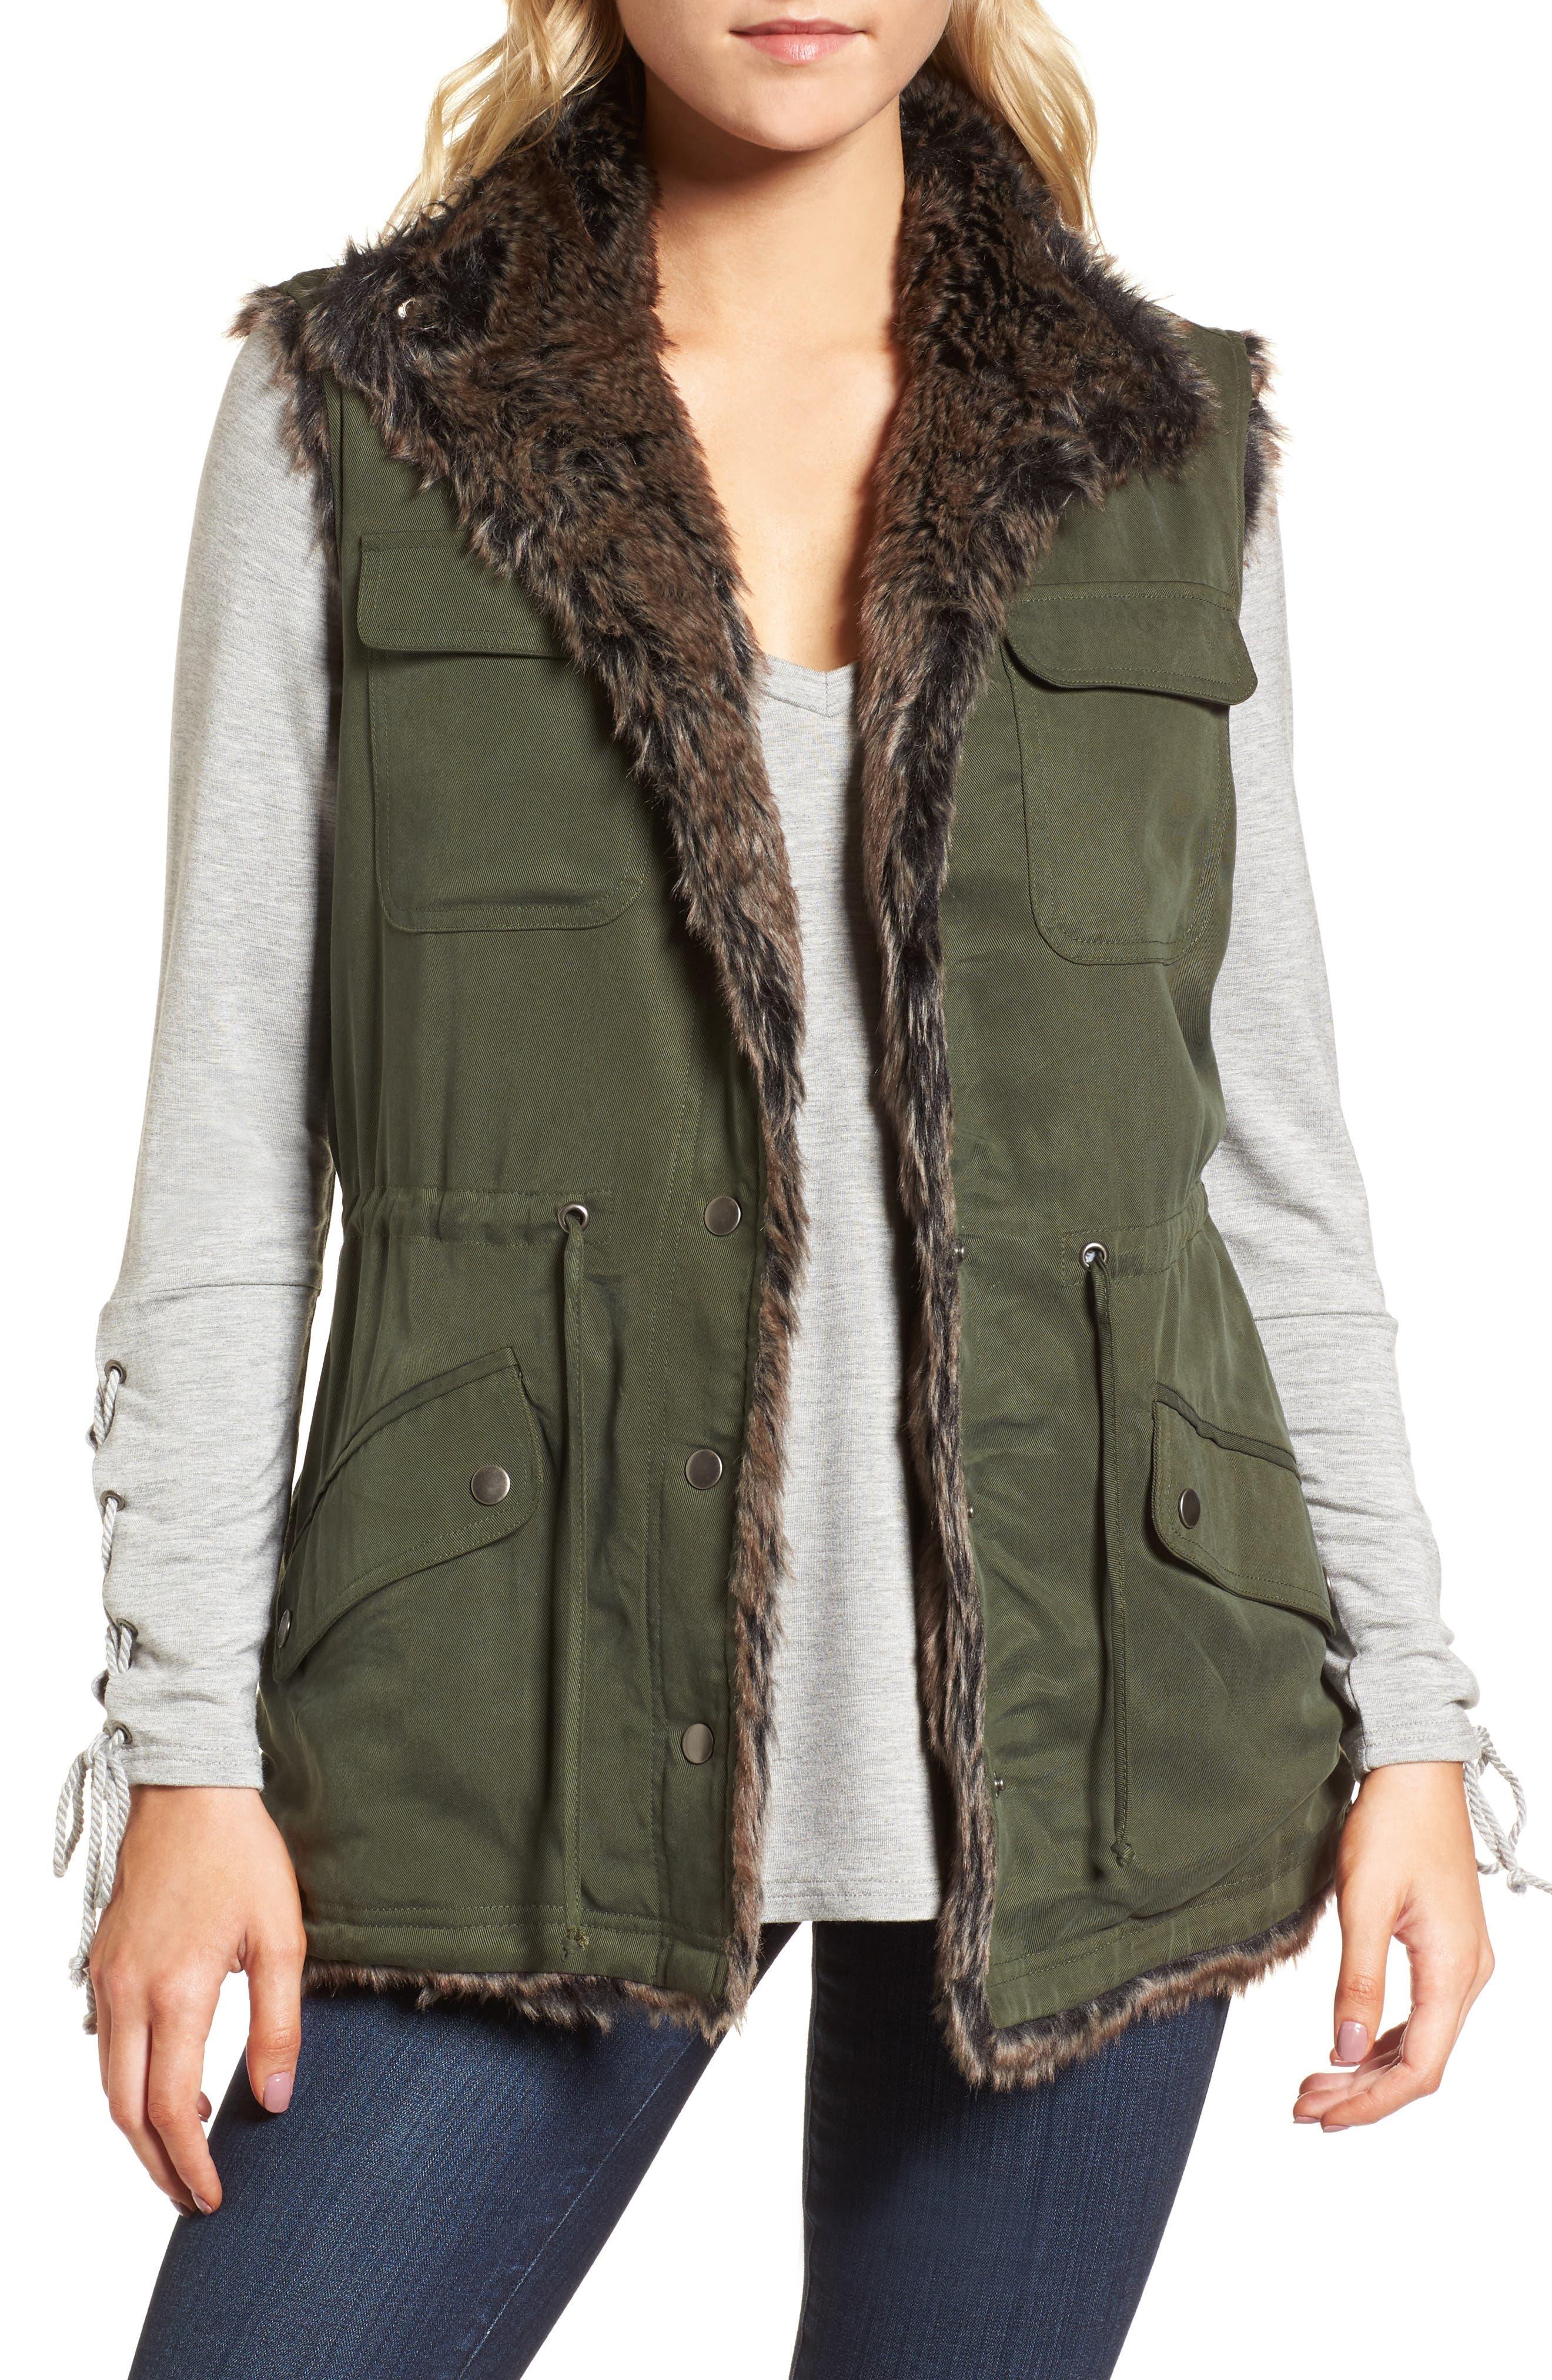 Ashling Faux Fur Lined Utility Vest,                         Main,                         color, Army